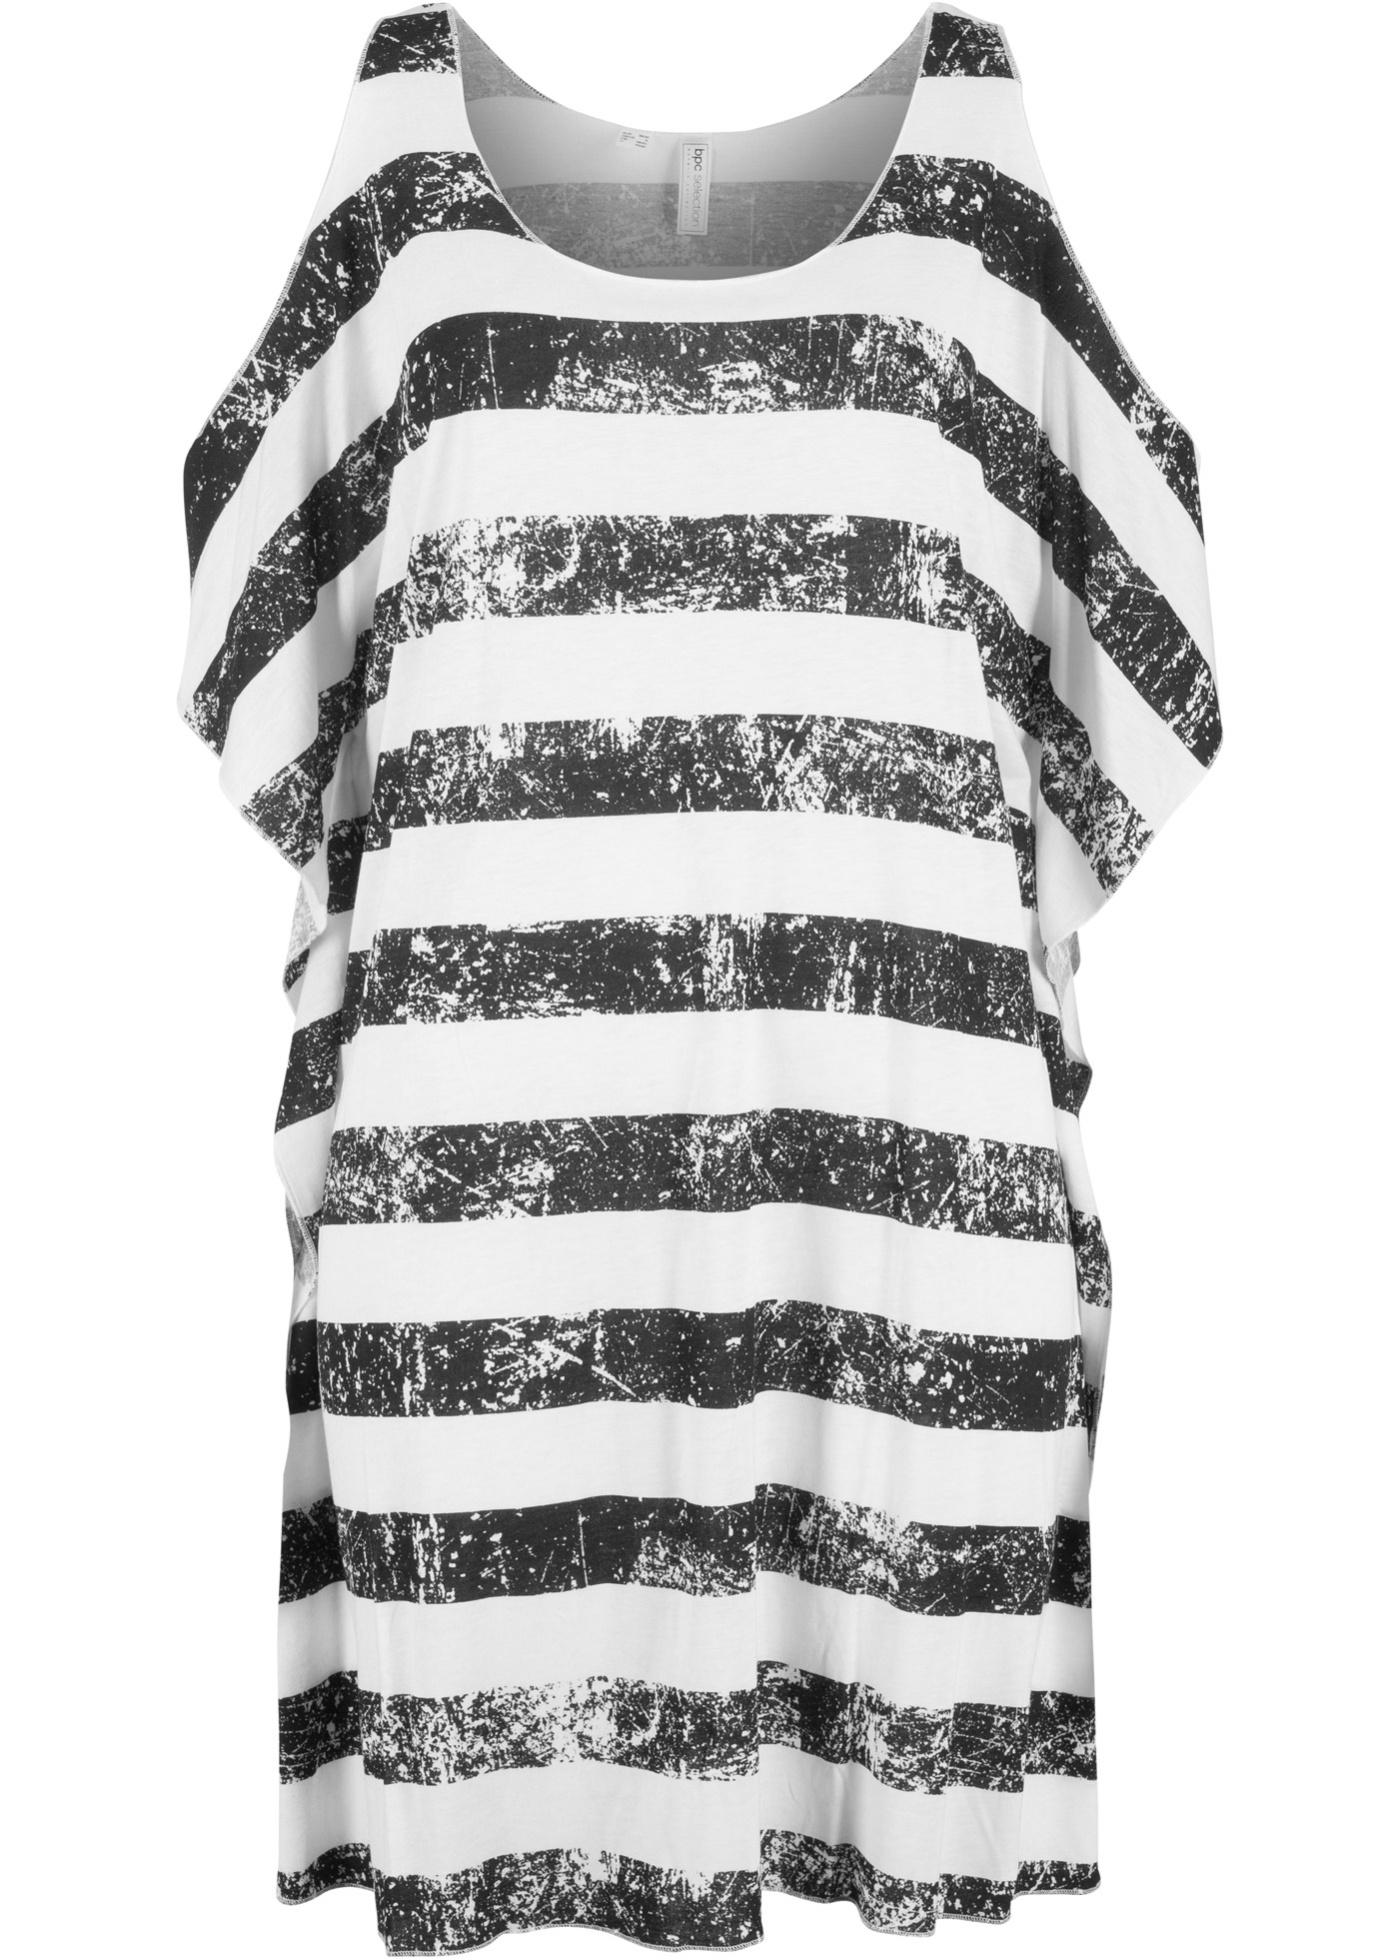 Levné Plážové tričko   Černá barva šatů